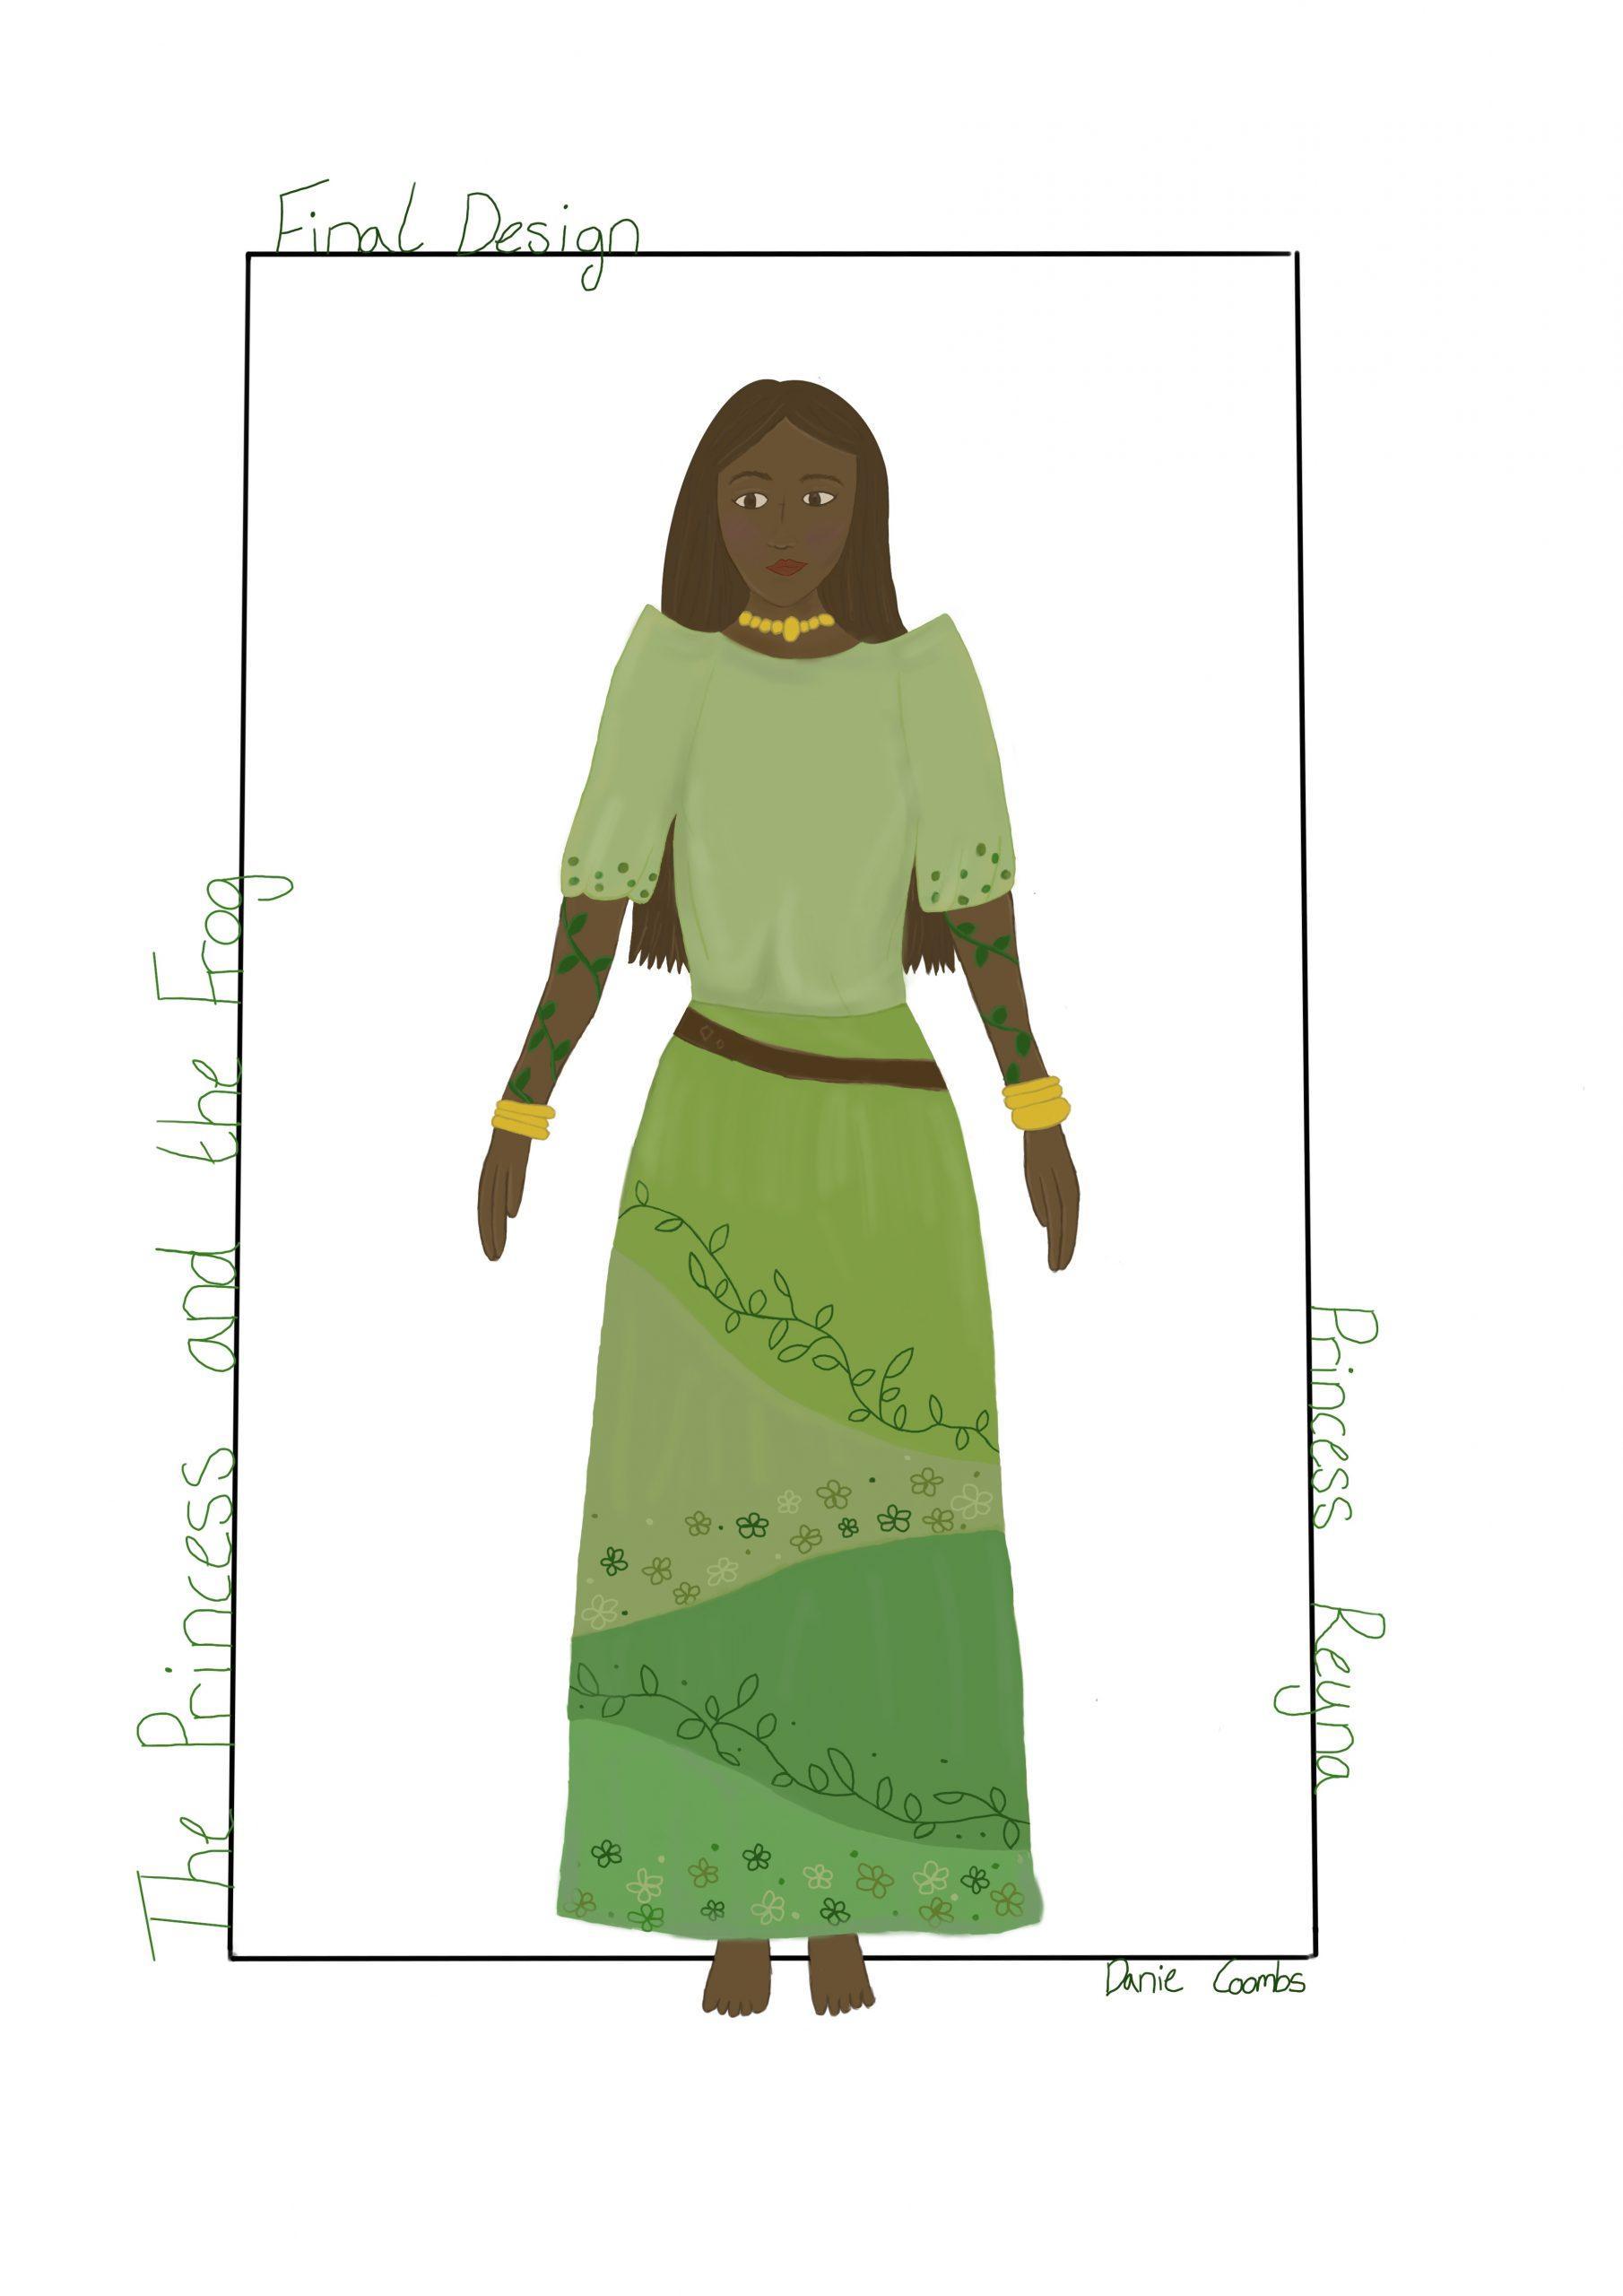 Princess Reyna final digital design